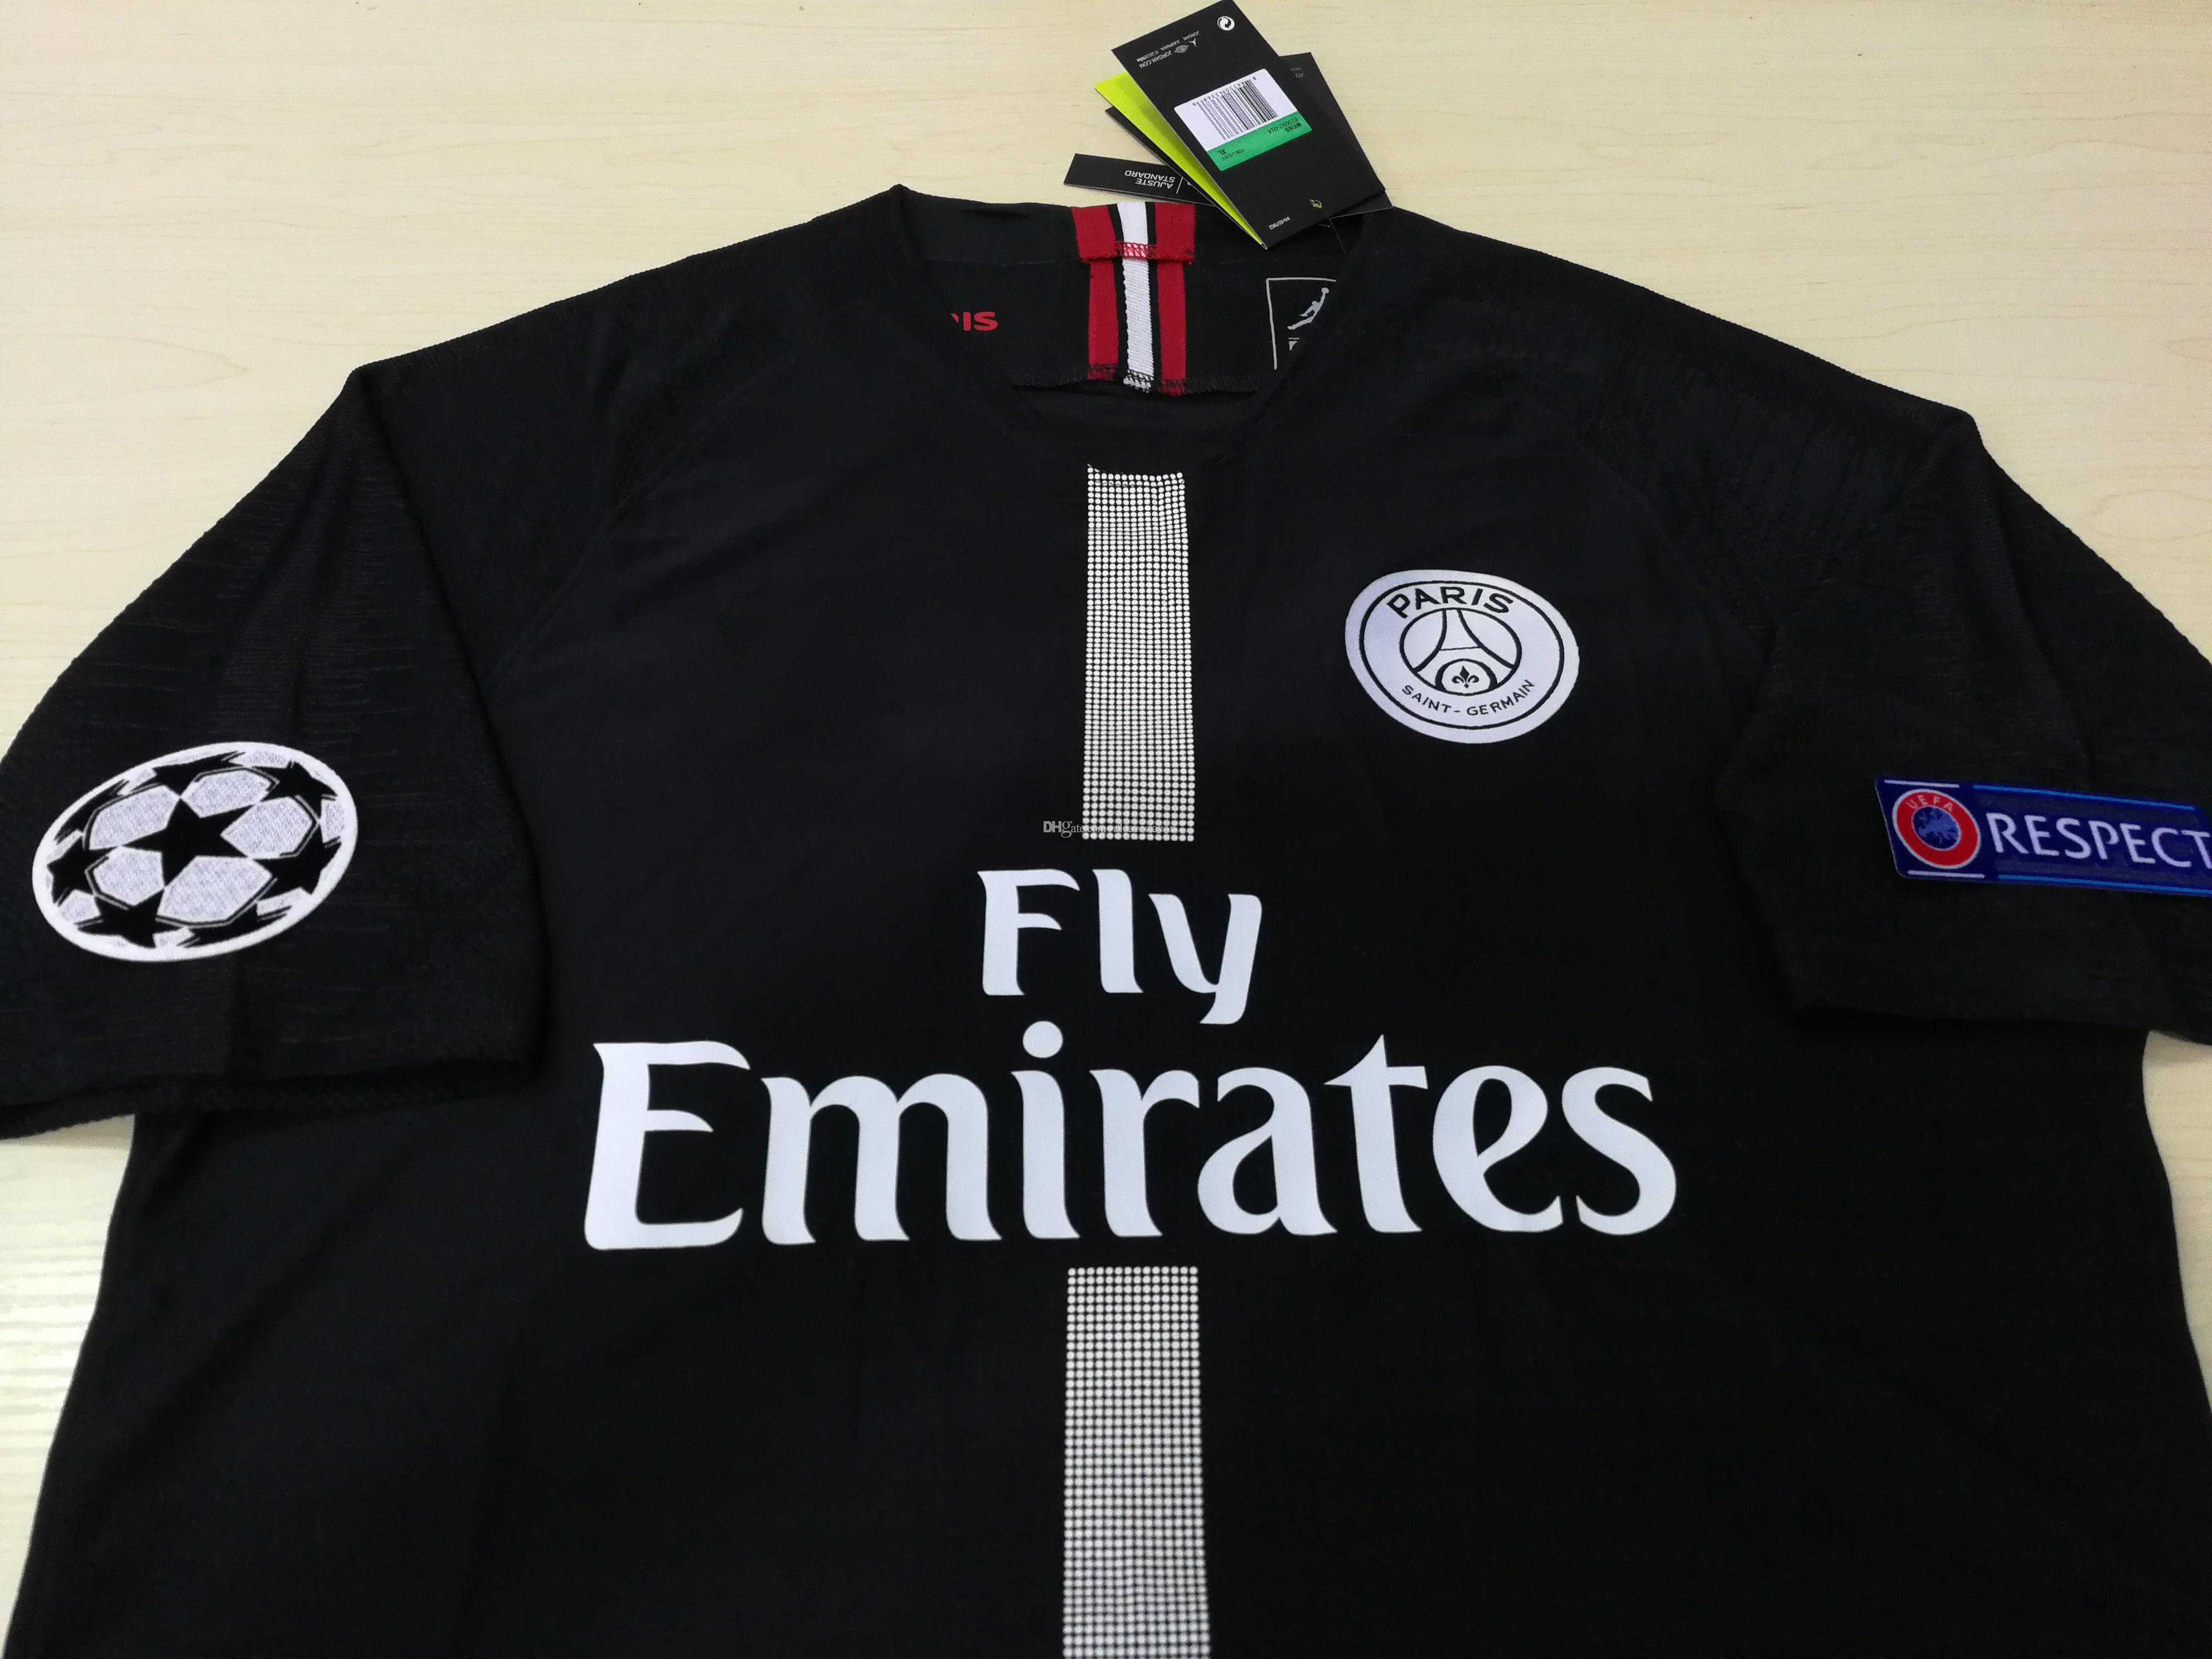 ee221b4c043 2019 2018 2019 Player Version Paris Saint Germain Jerseys 7 MBAPPE BUFFON  VERRATTI CAVANI Custom 18 19 PSG Home Away Football Training Shirt From ...